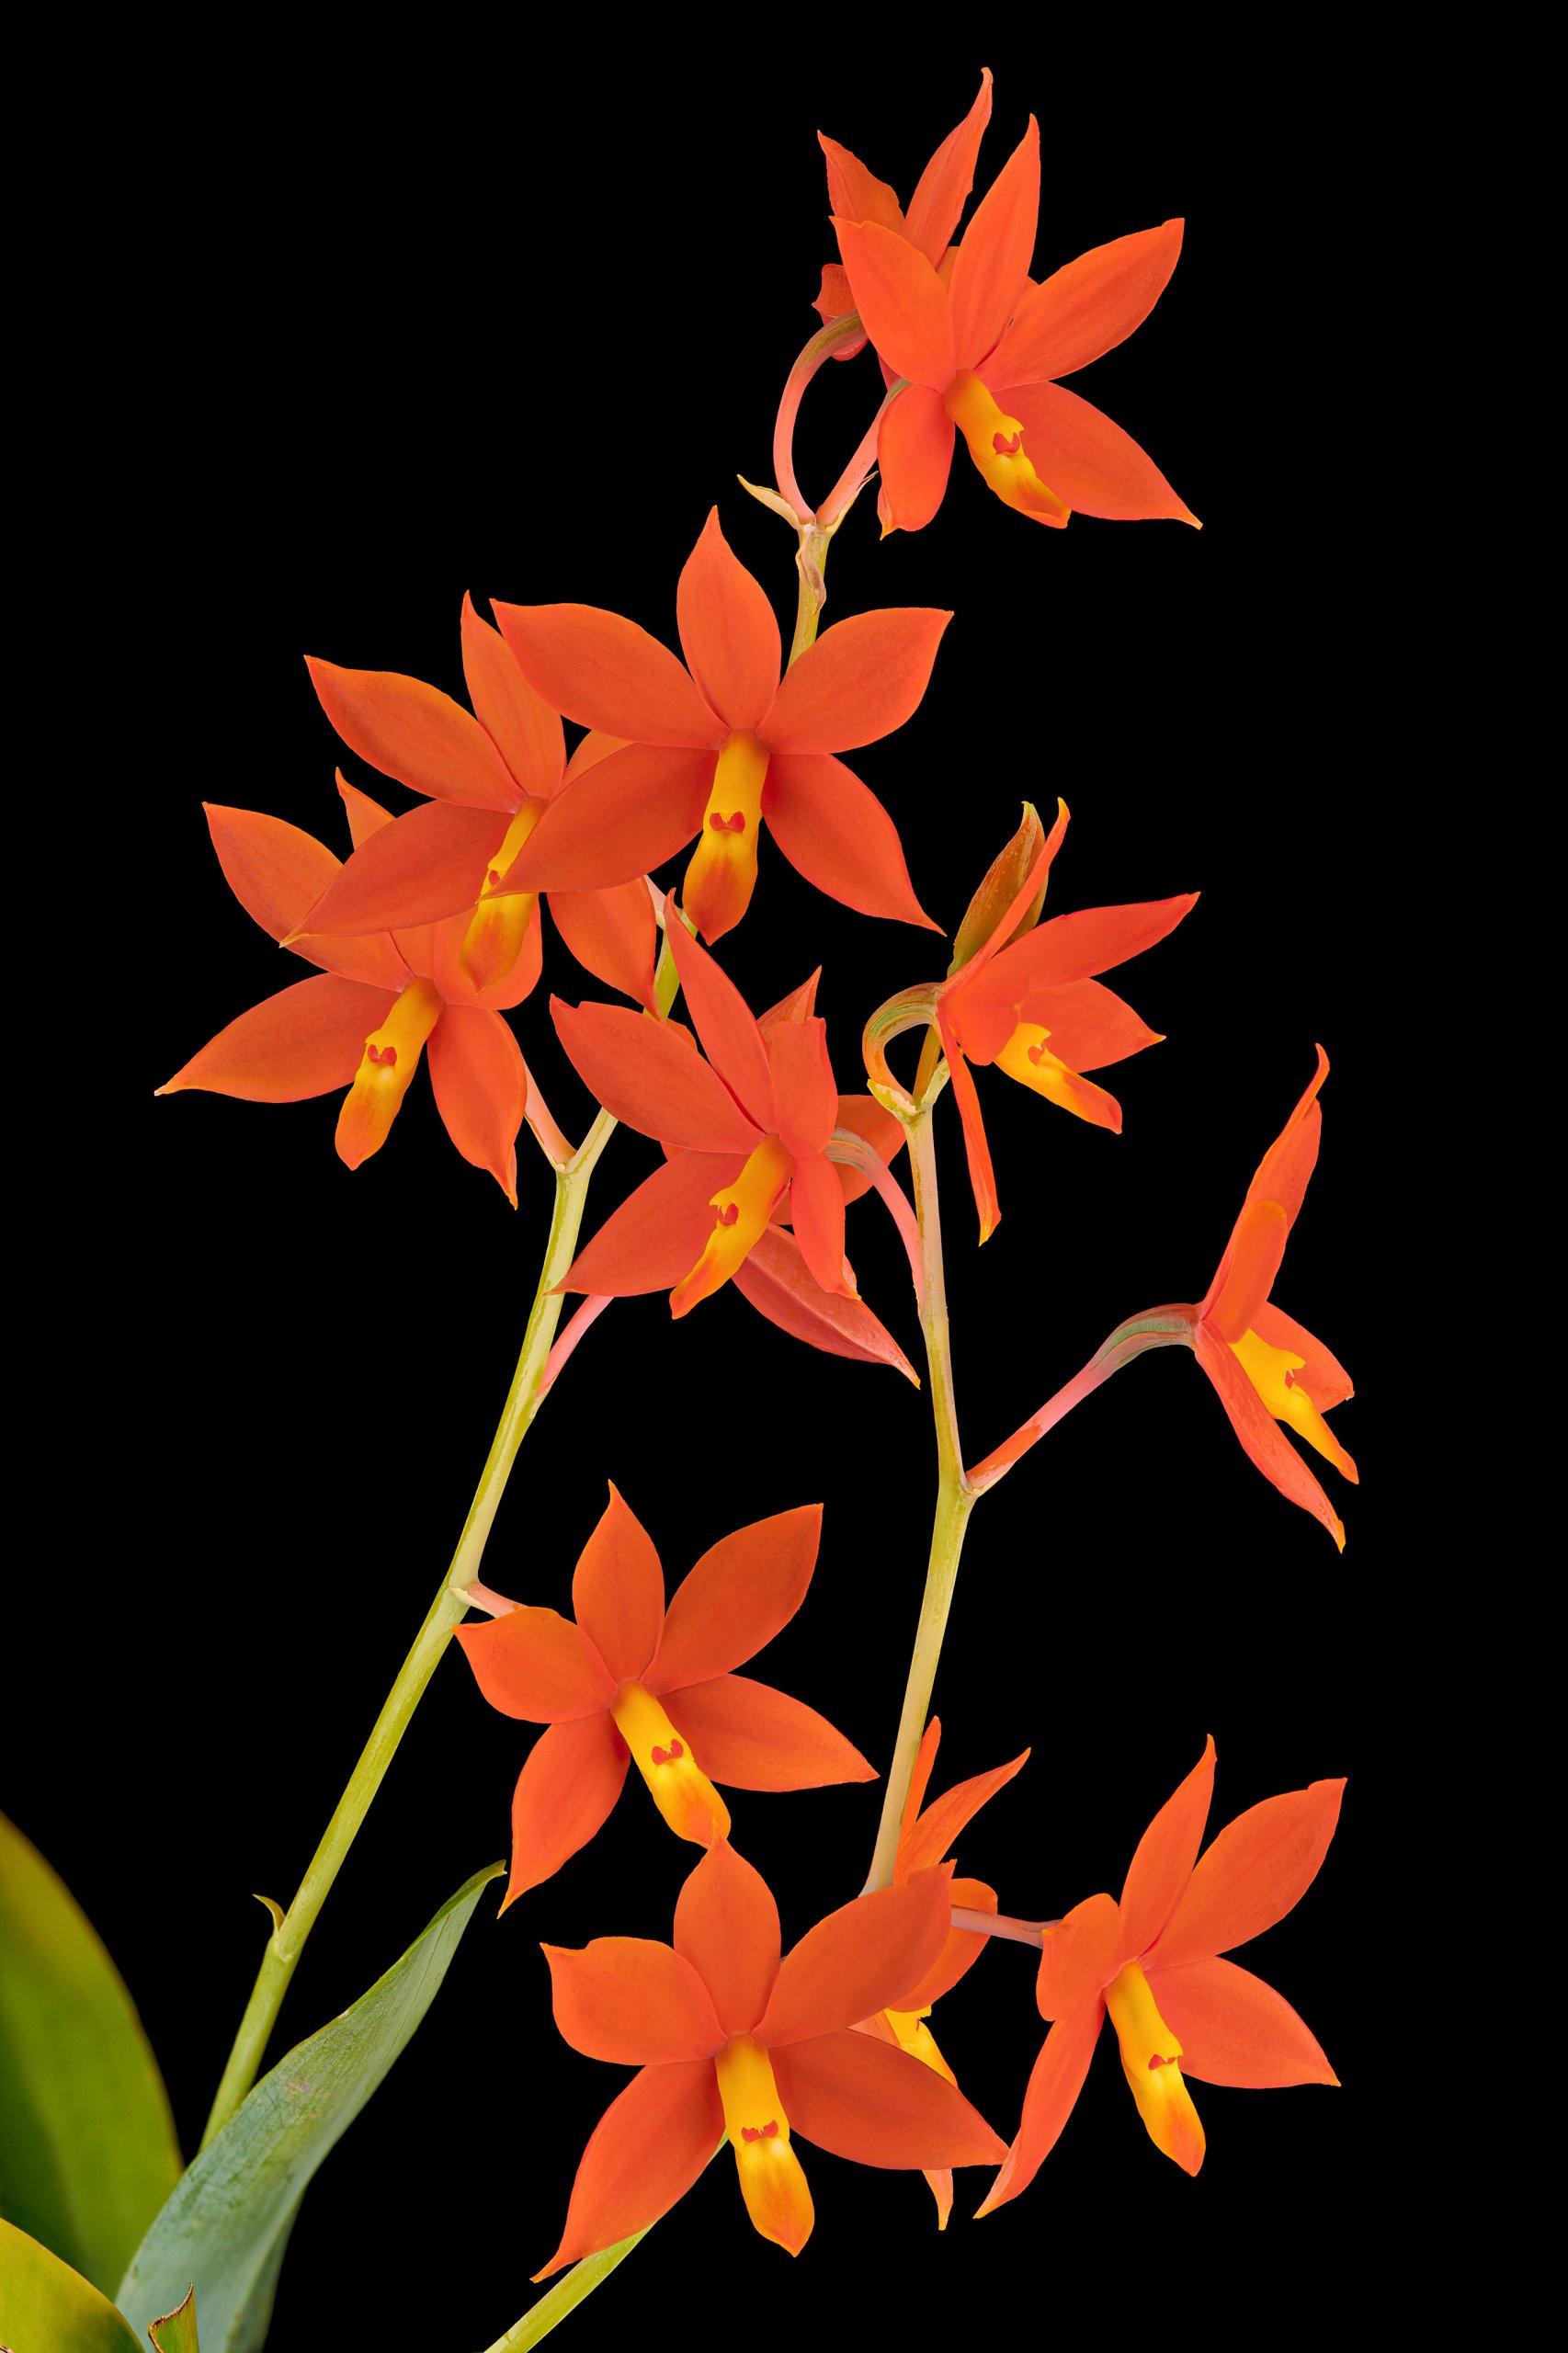 Encyclia vitellina flowers 05.25.20.jpg